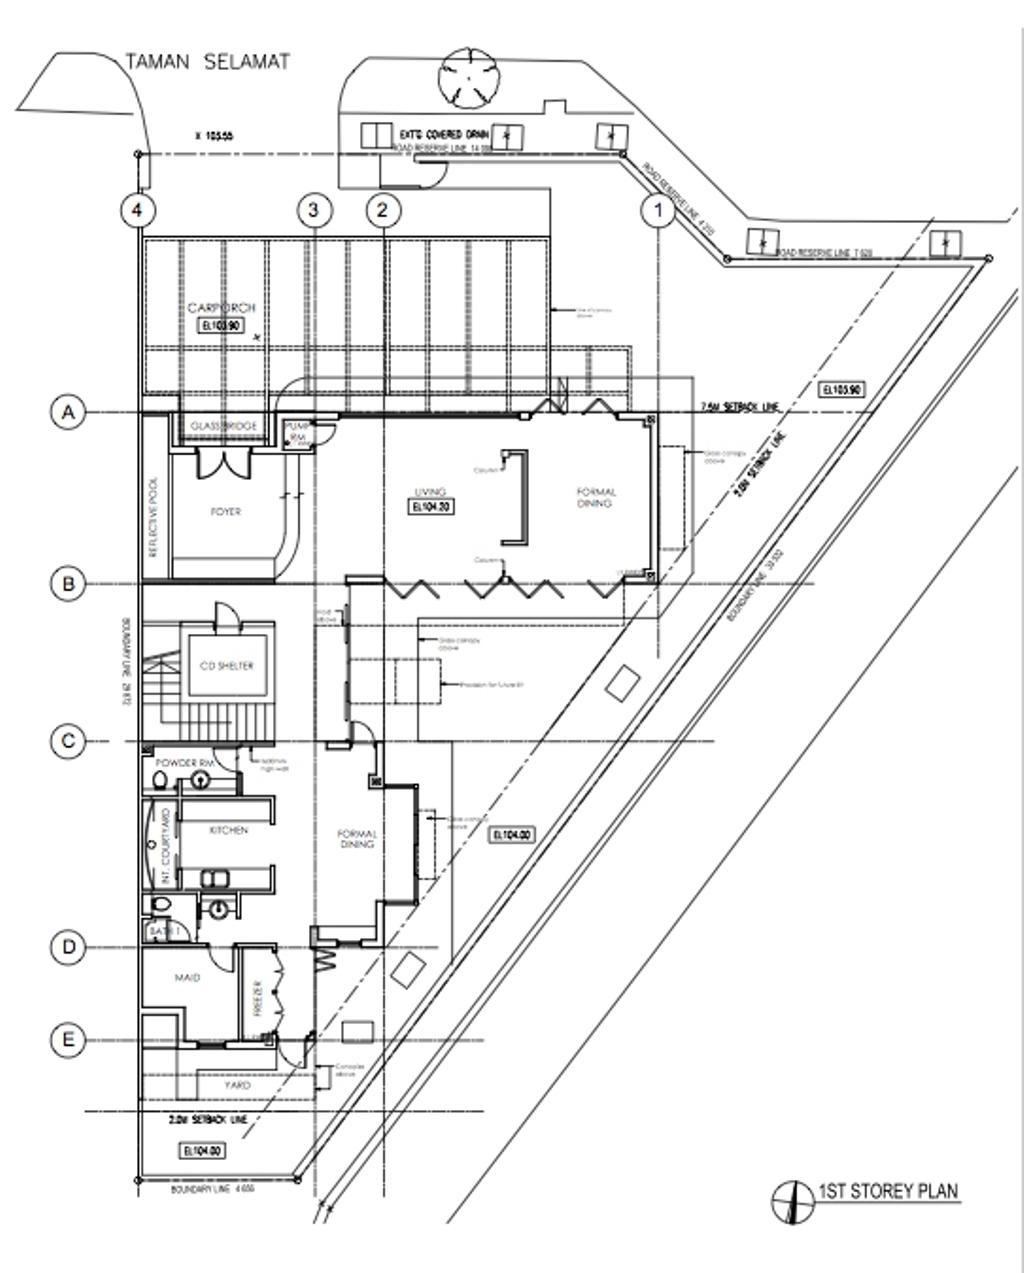 Traditional, Landed, Taman Selamat, Architect, AgFacadesign Architects, Floor Plan, Diagram, Plan